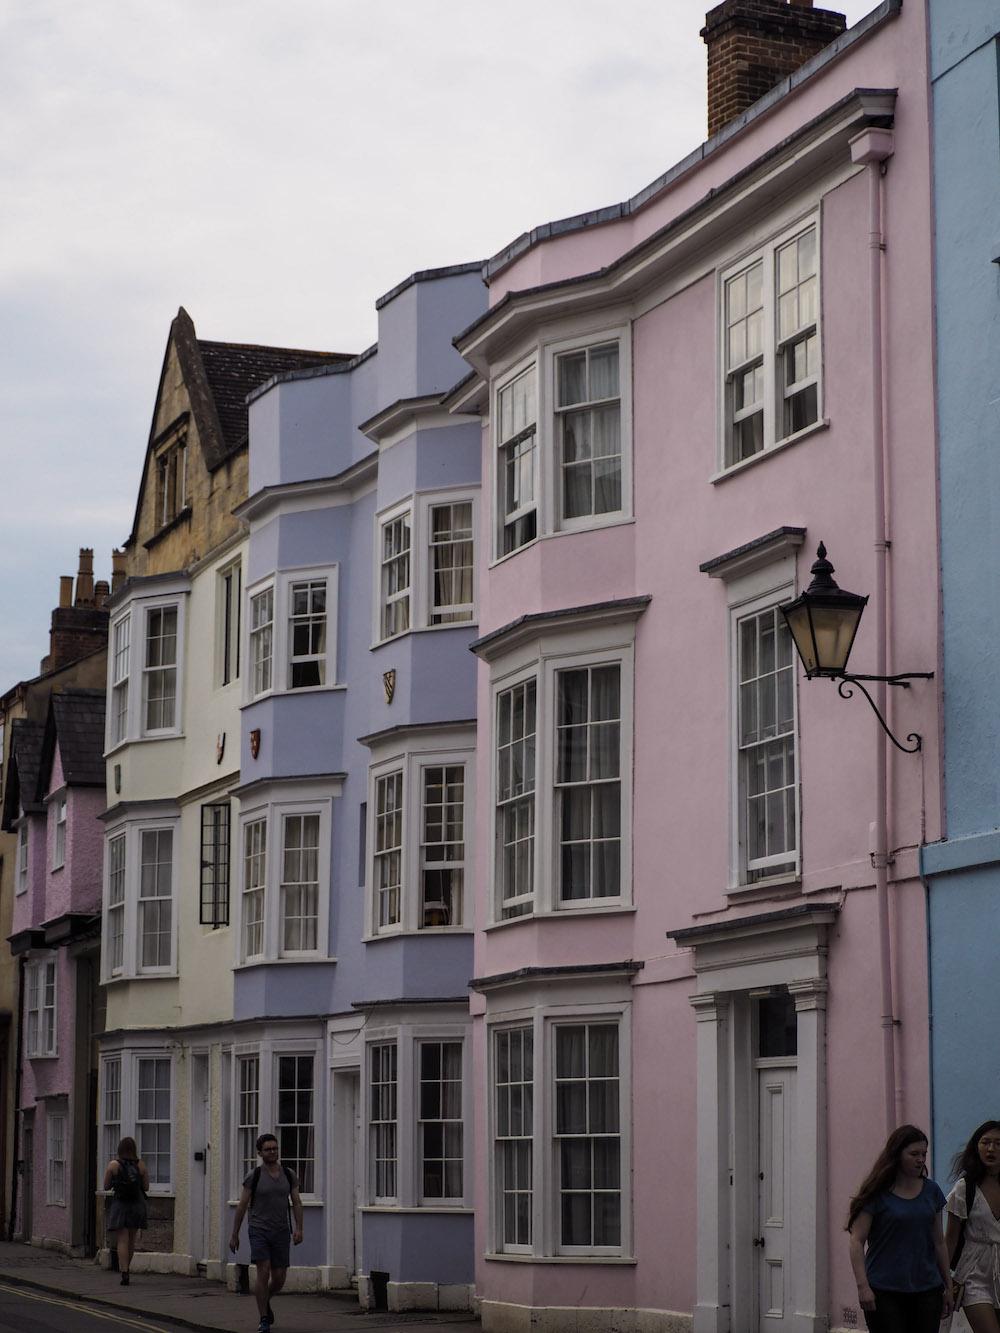 Oxford Day Trip, Holywell Street